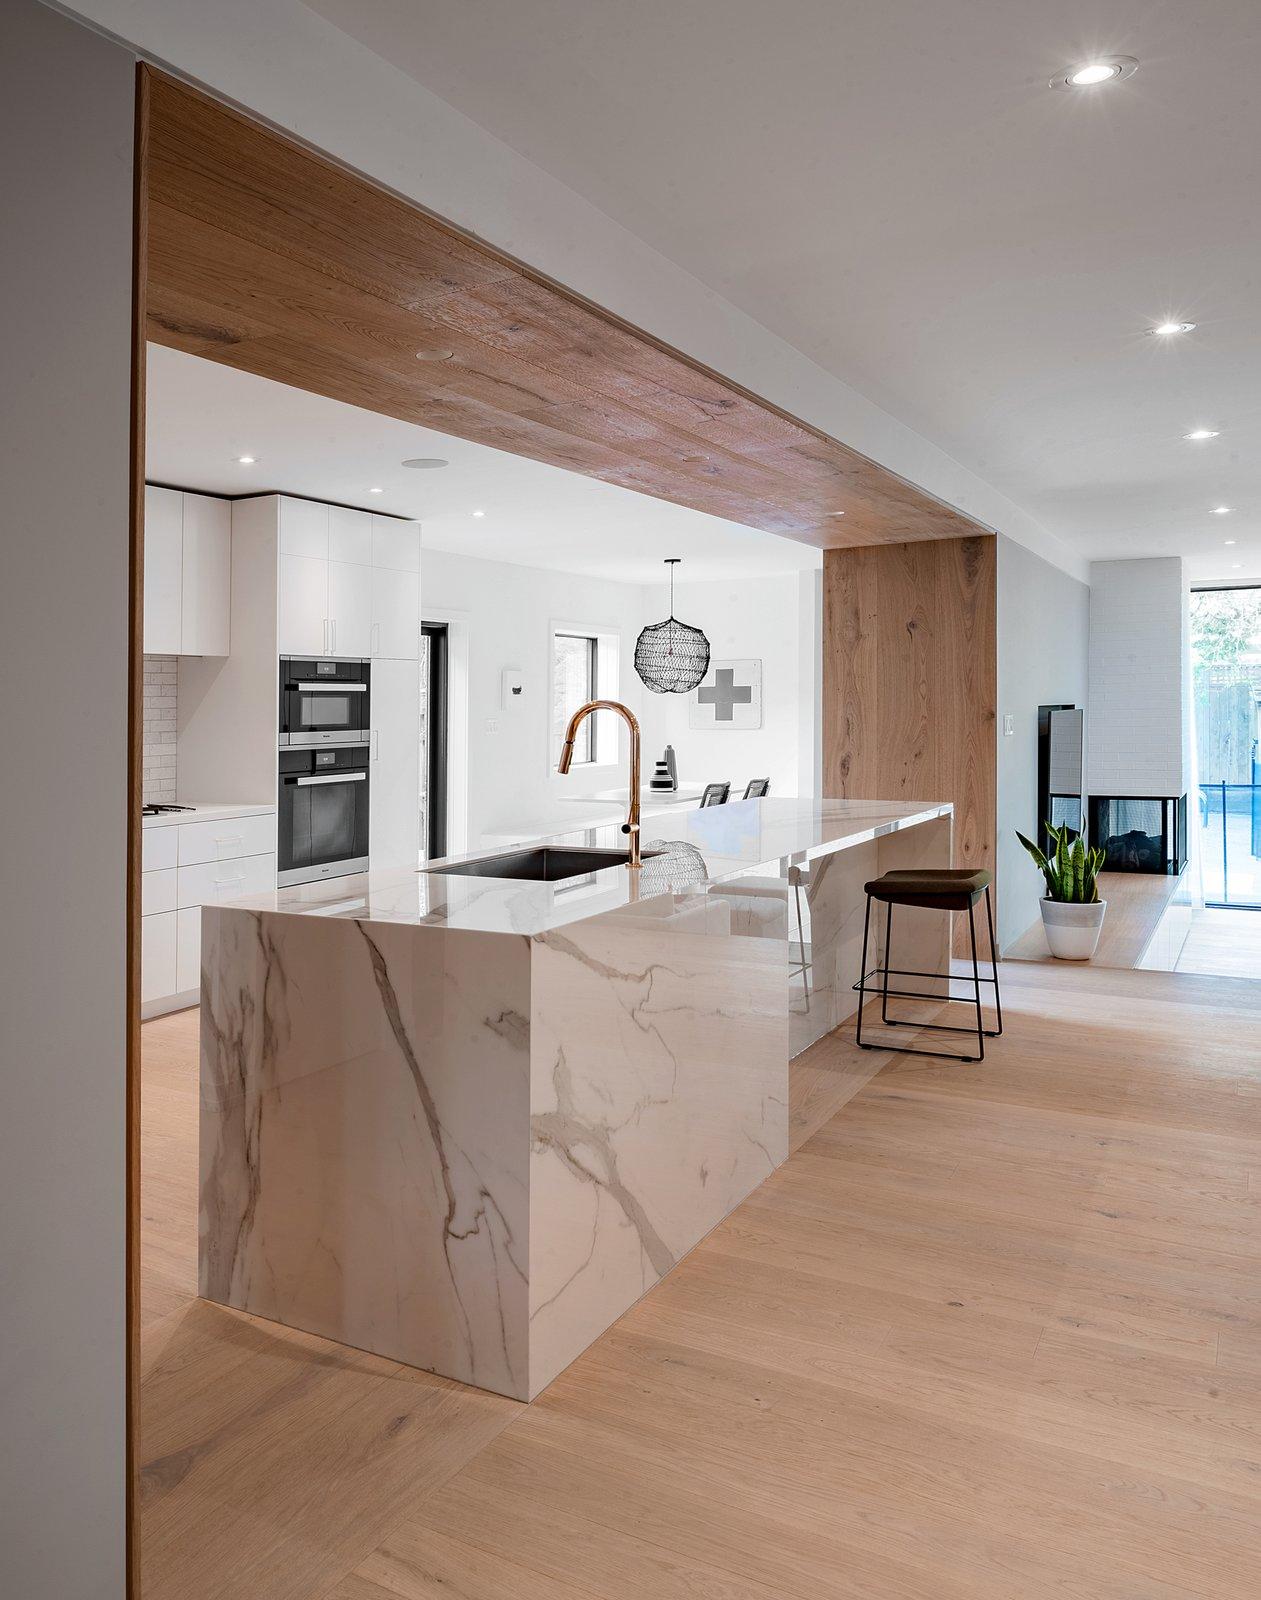 Kitchen, Quartzite Counter, White Cabinet, Light Hardwood Floor, Ceiling Lighting, Subway Tile Backsplashe, Recessed Lighting, Undermount Sink, and Wall Oven  Richview Residence